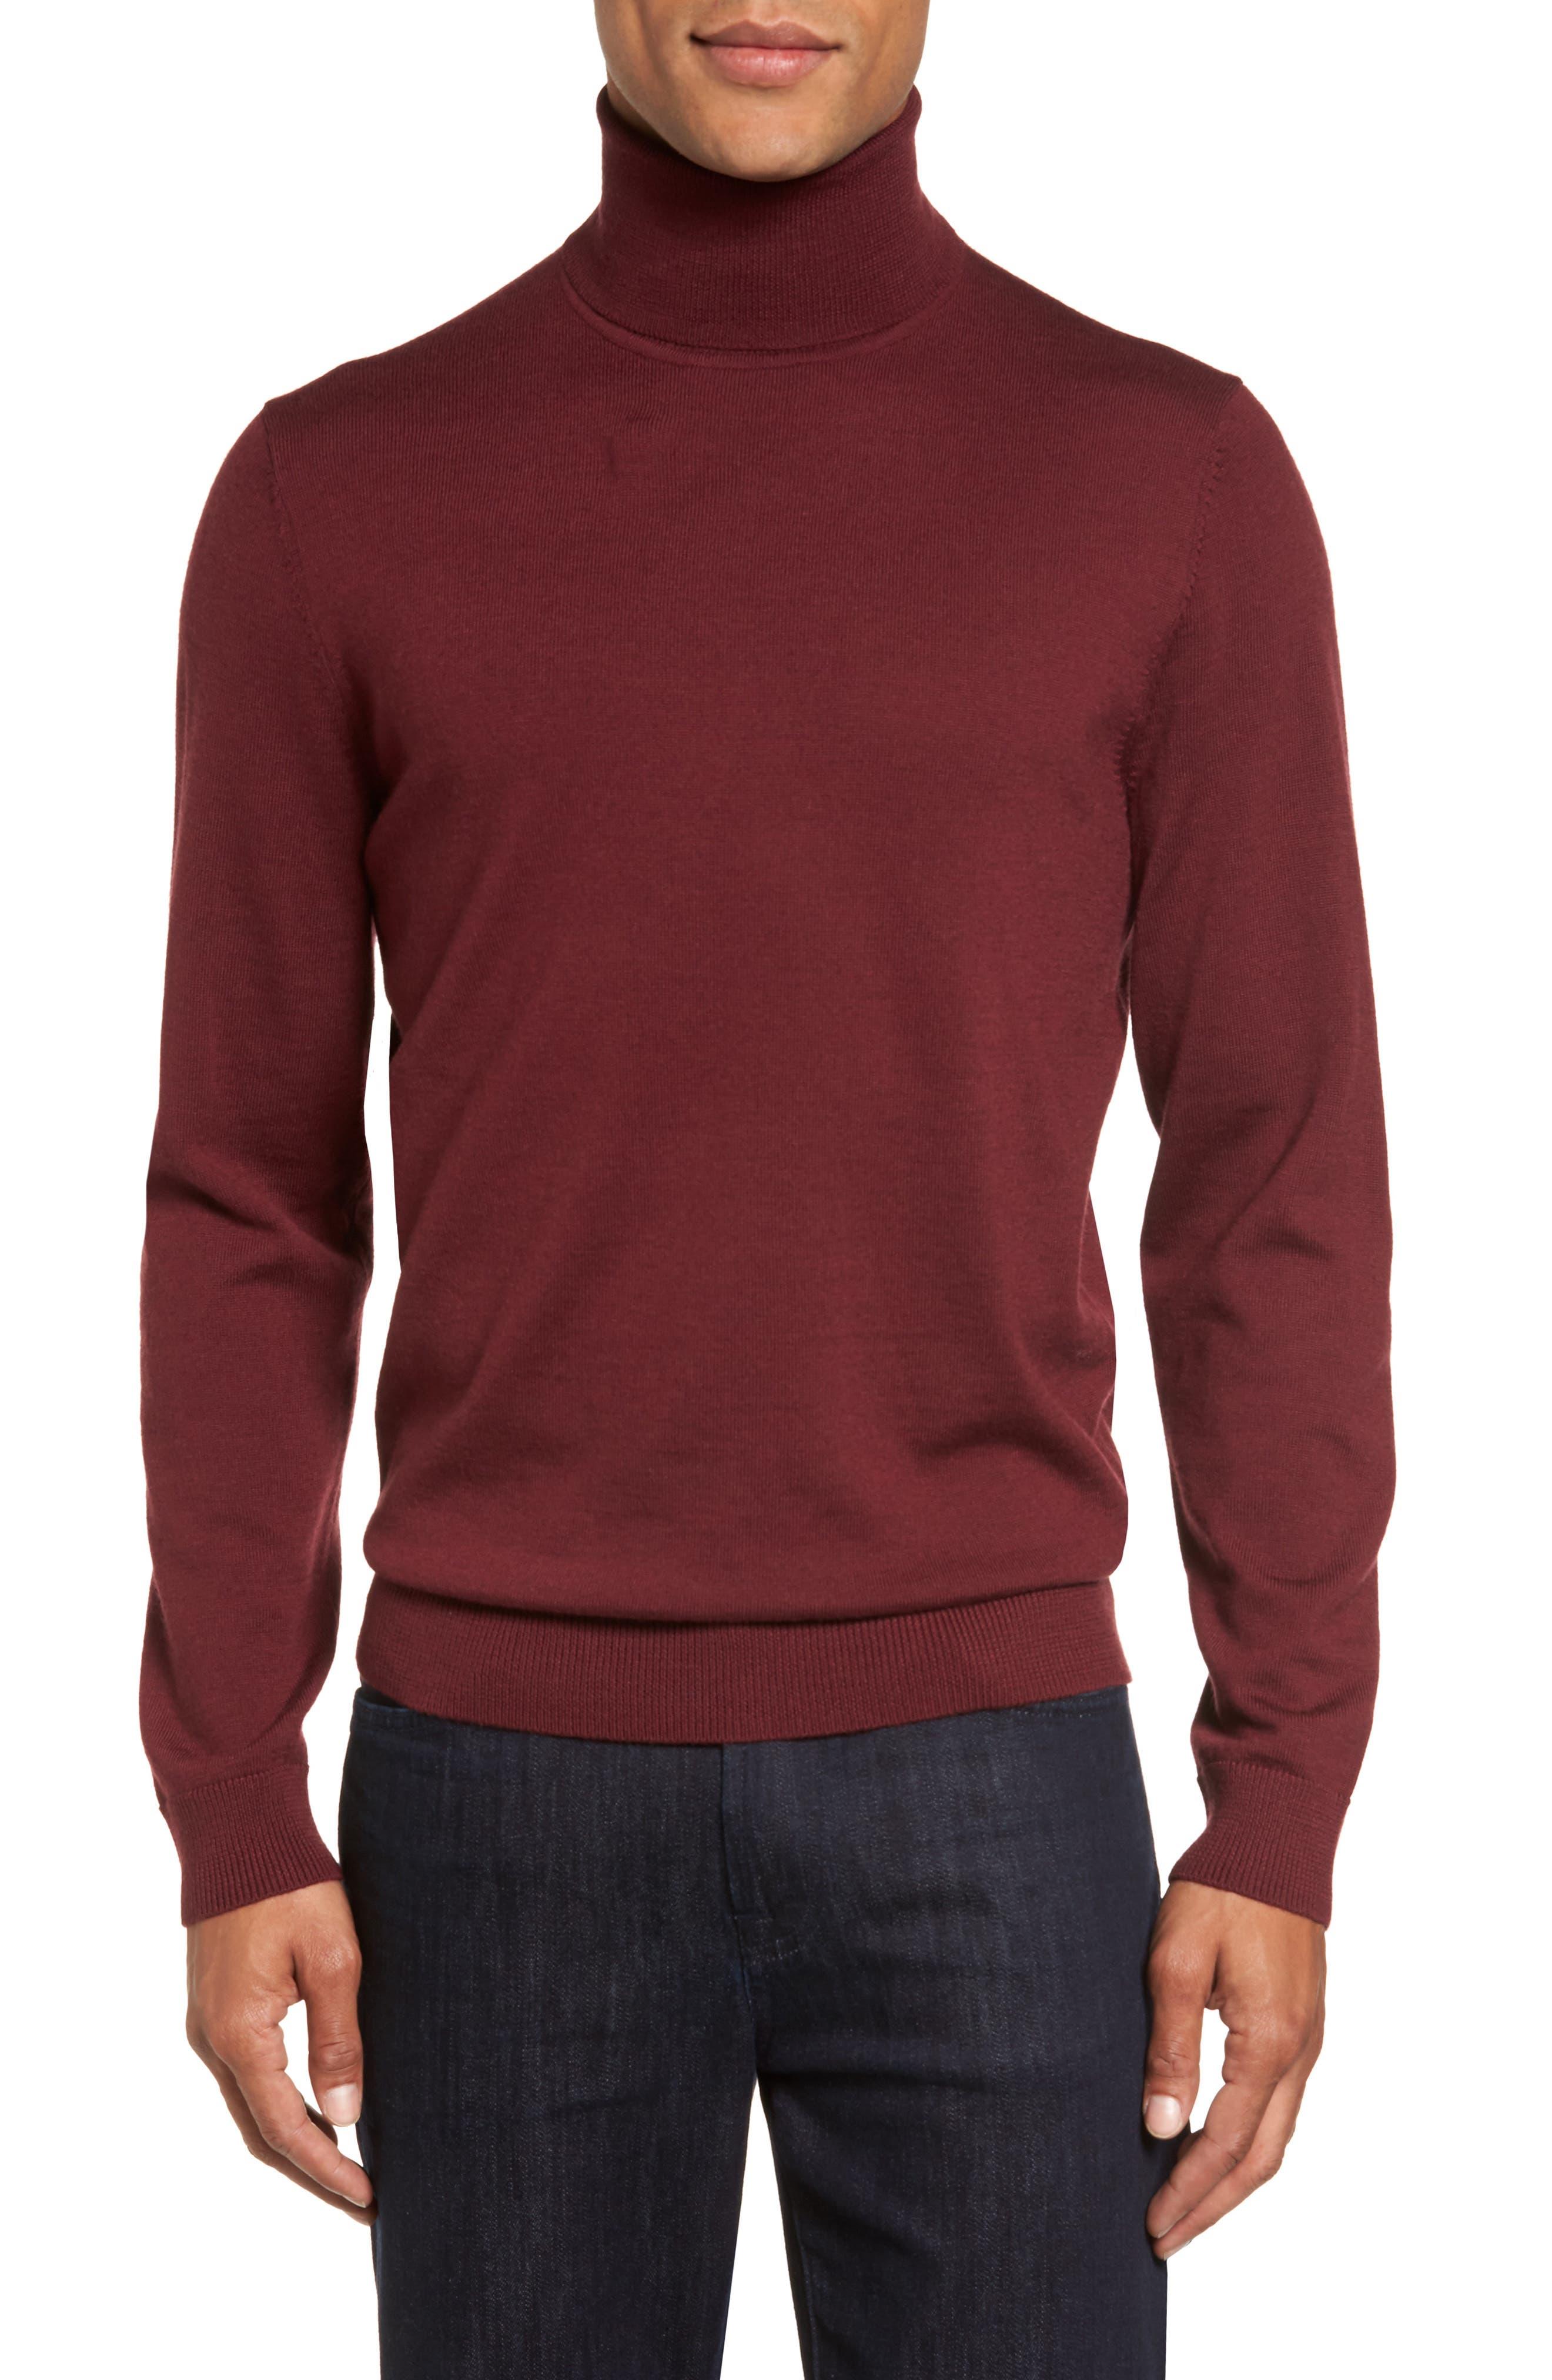 Nordstrom Shop Merino Wool Turtleneck Sweater, Burgundy